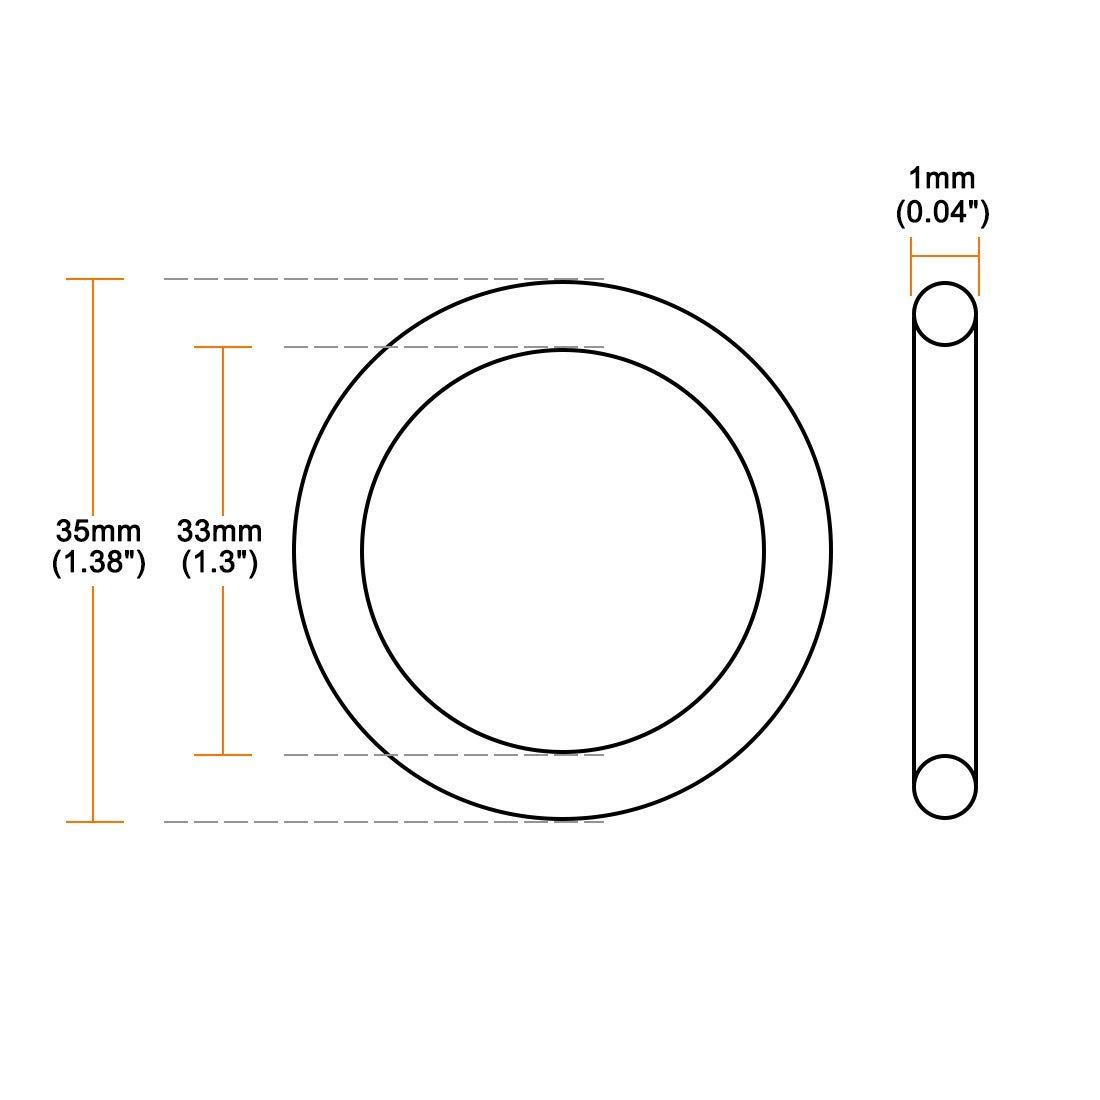 Diaphragm Chemical Metering Pump Flow LMH8TA-PTCB-G19 504.00 GPD Max Pulsafeeder 20 psi 115VAC Adjustable Output